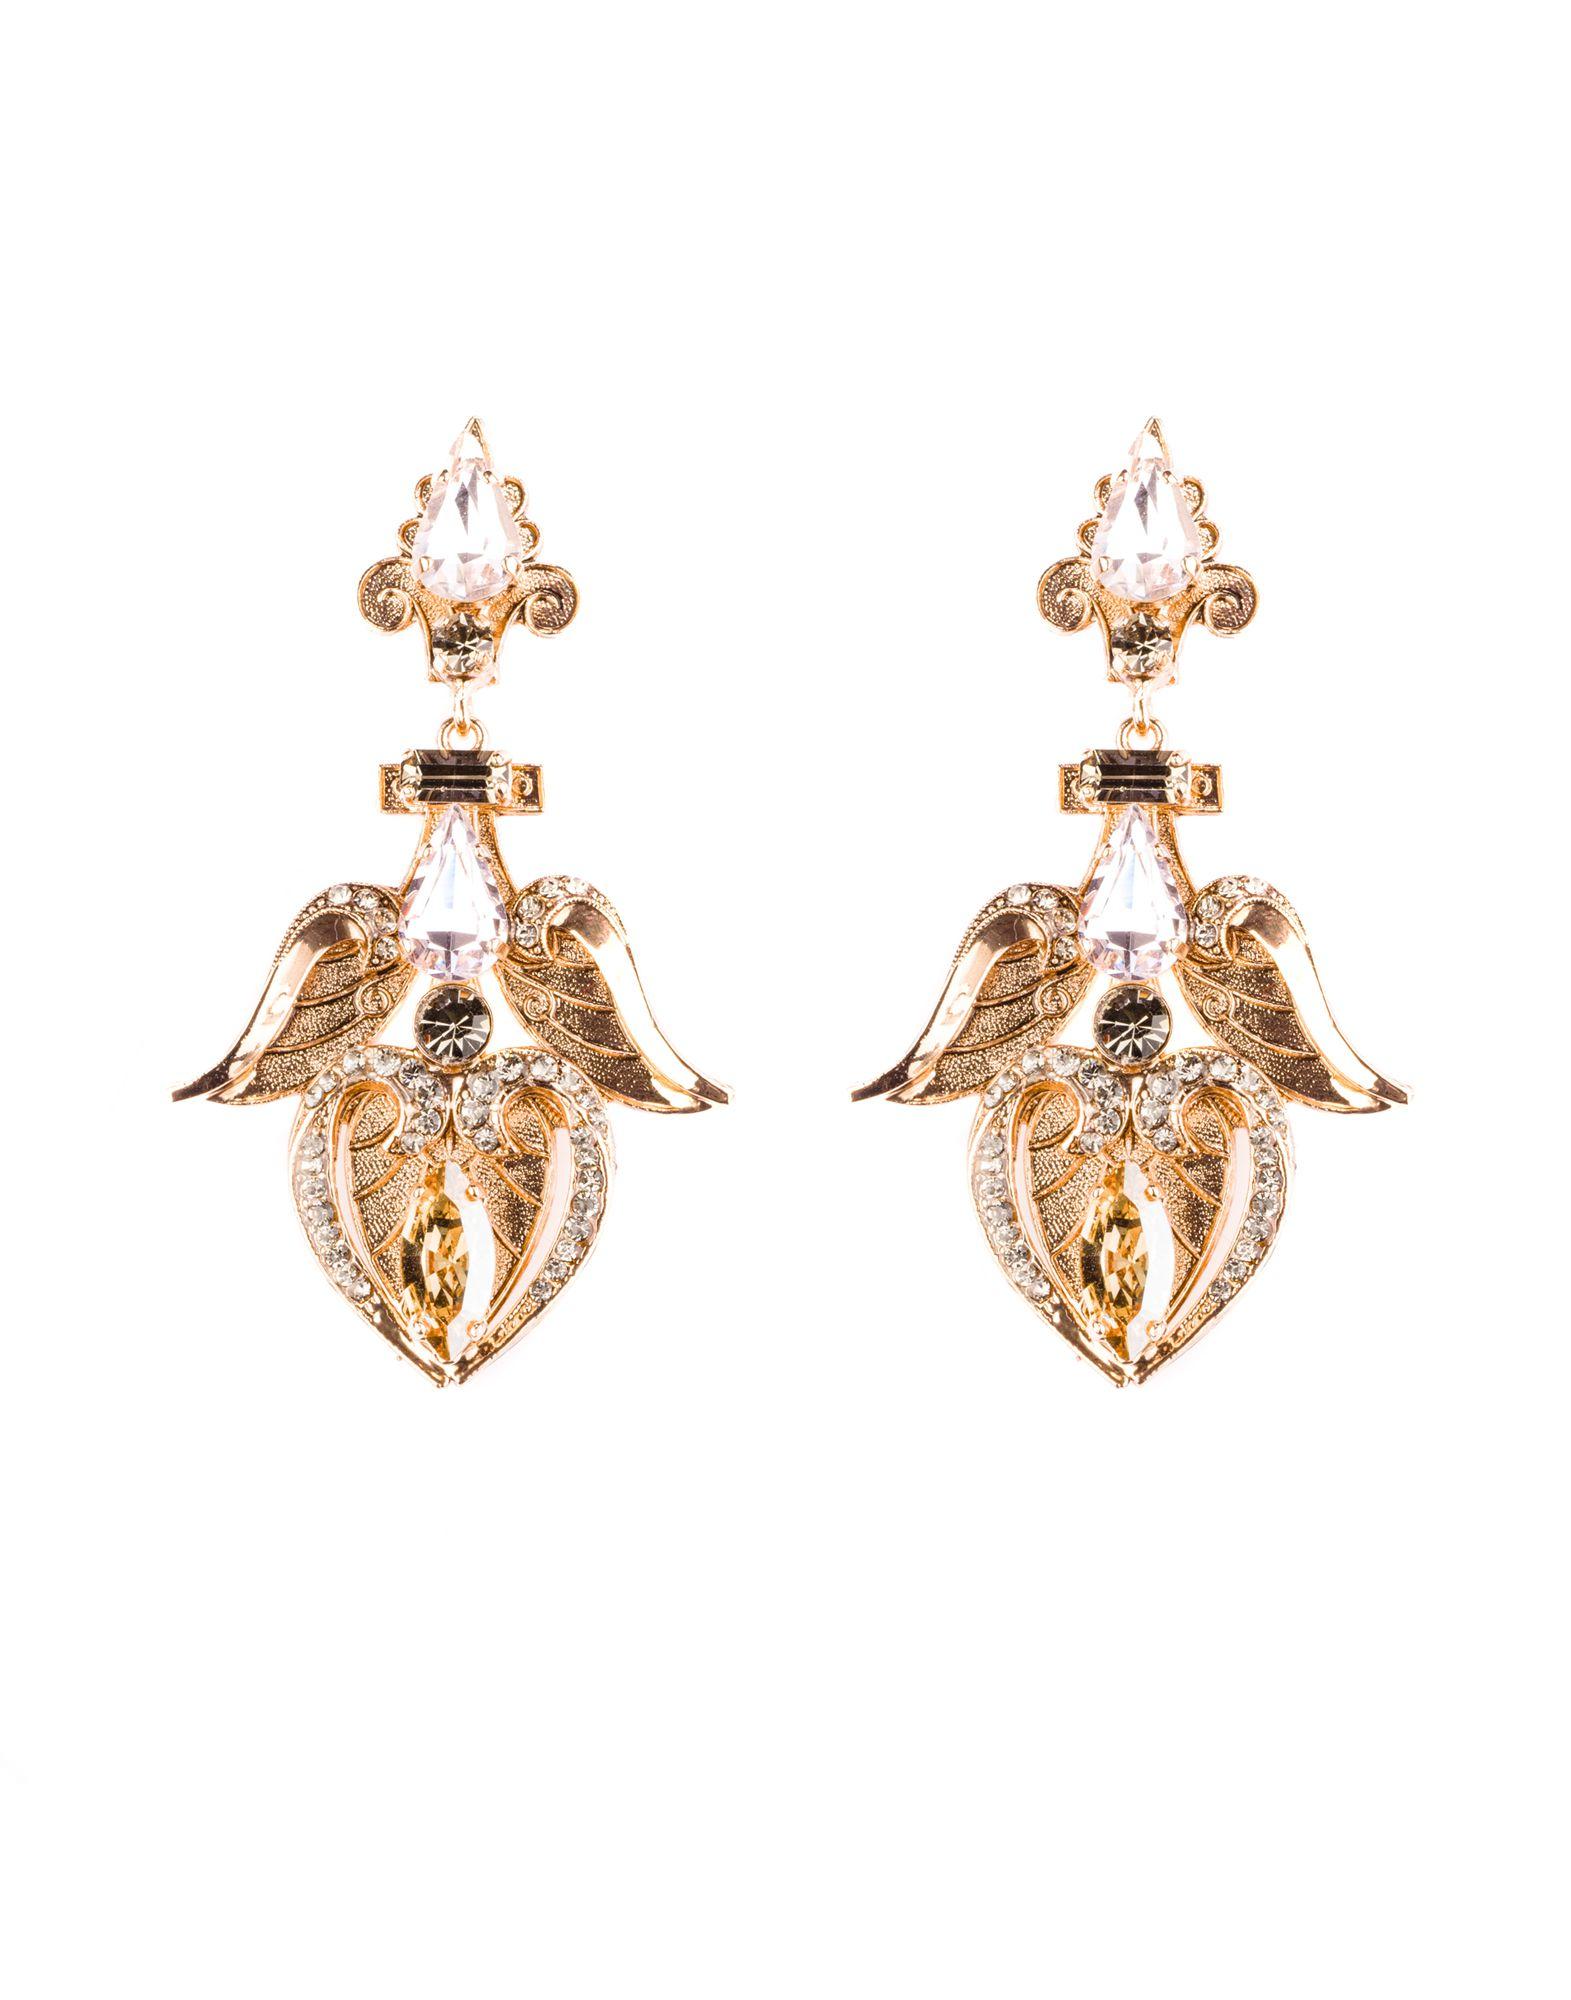 thot gioielli earrings shop at ebates